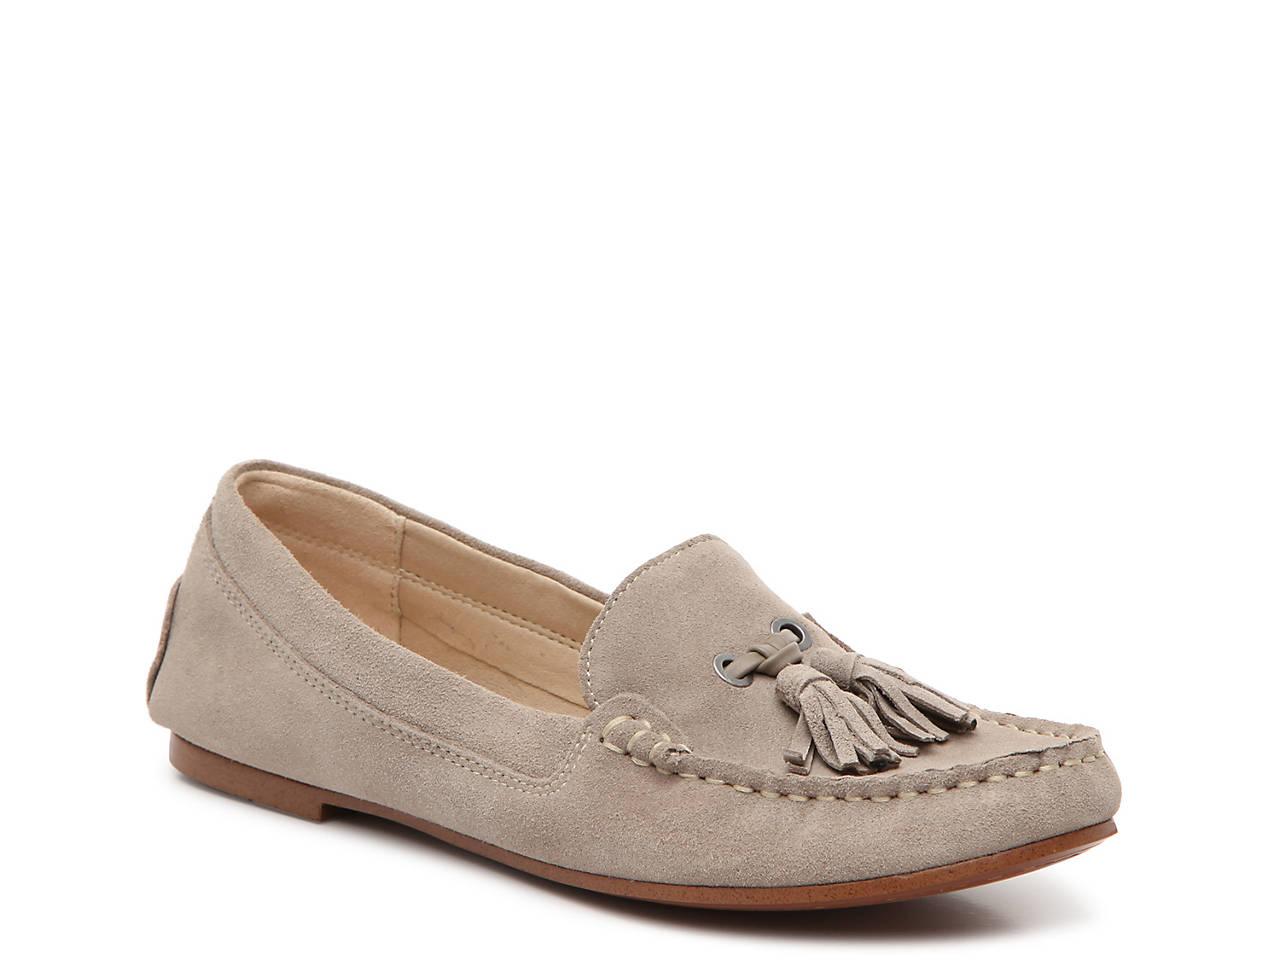 ec6744c7f84c Sam Edelman Aggie Loafer Women s Shoes